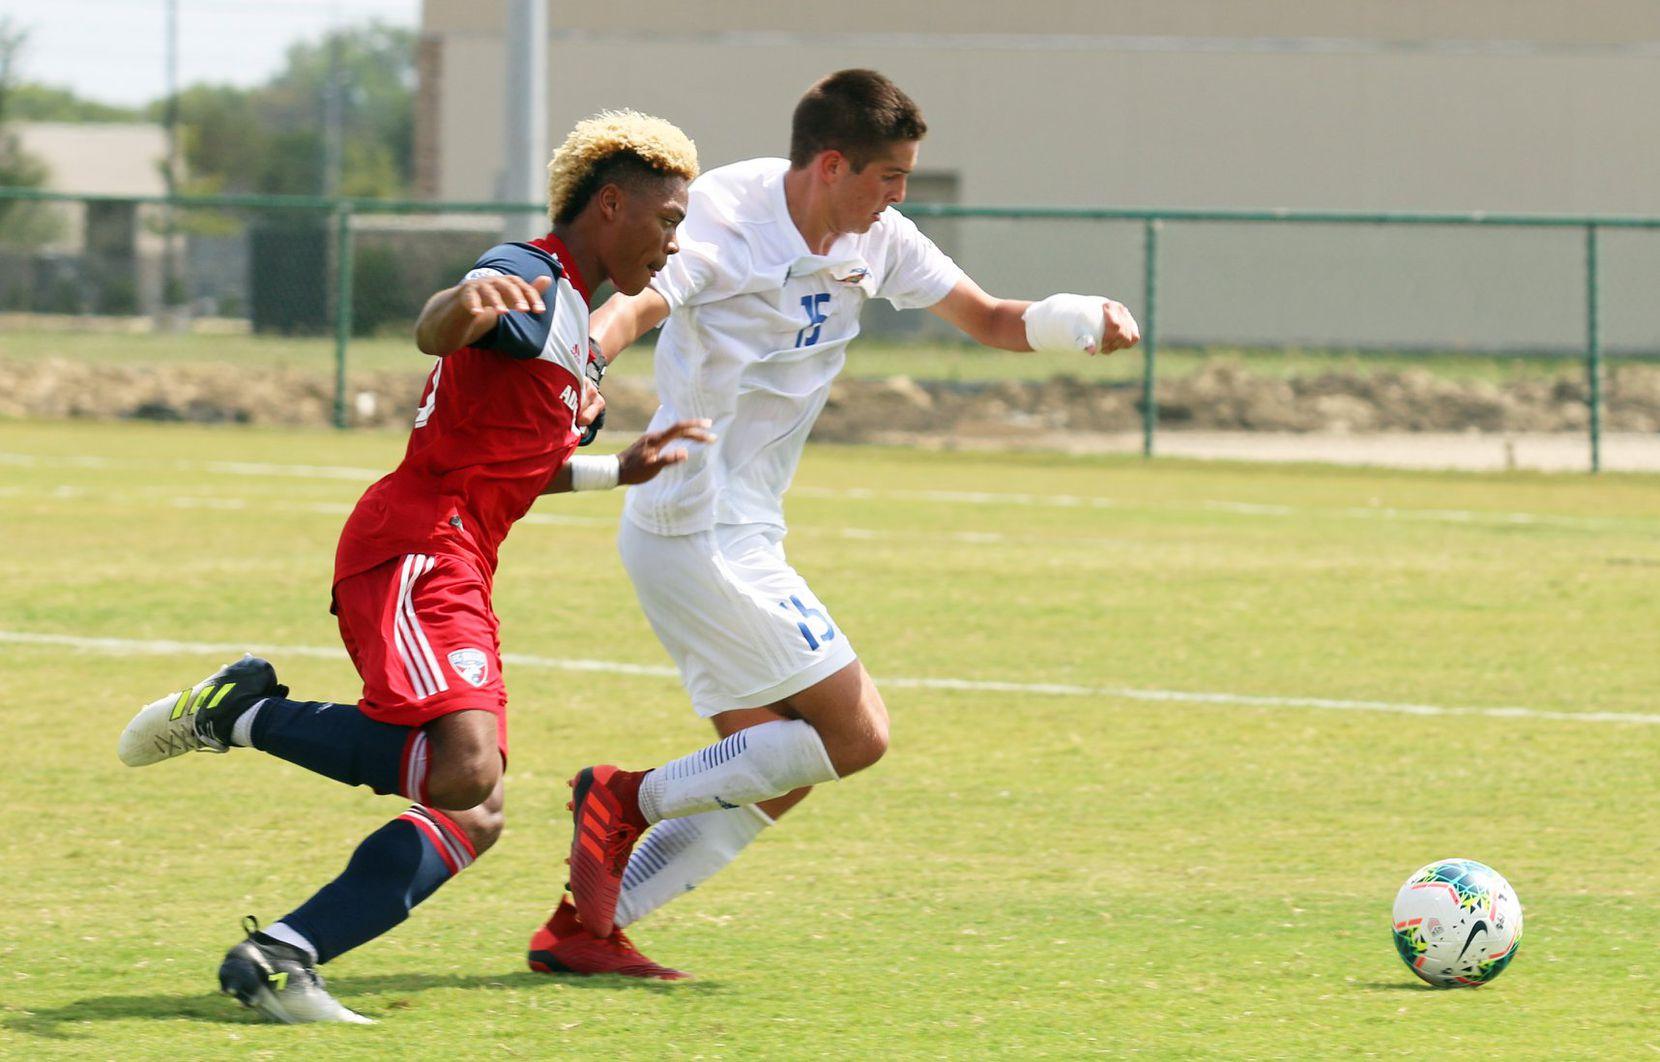 Conner Lewis (#15 white) of Solar SC defends against Malik Henry-Scott of FC Dallas. (9-22-19)